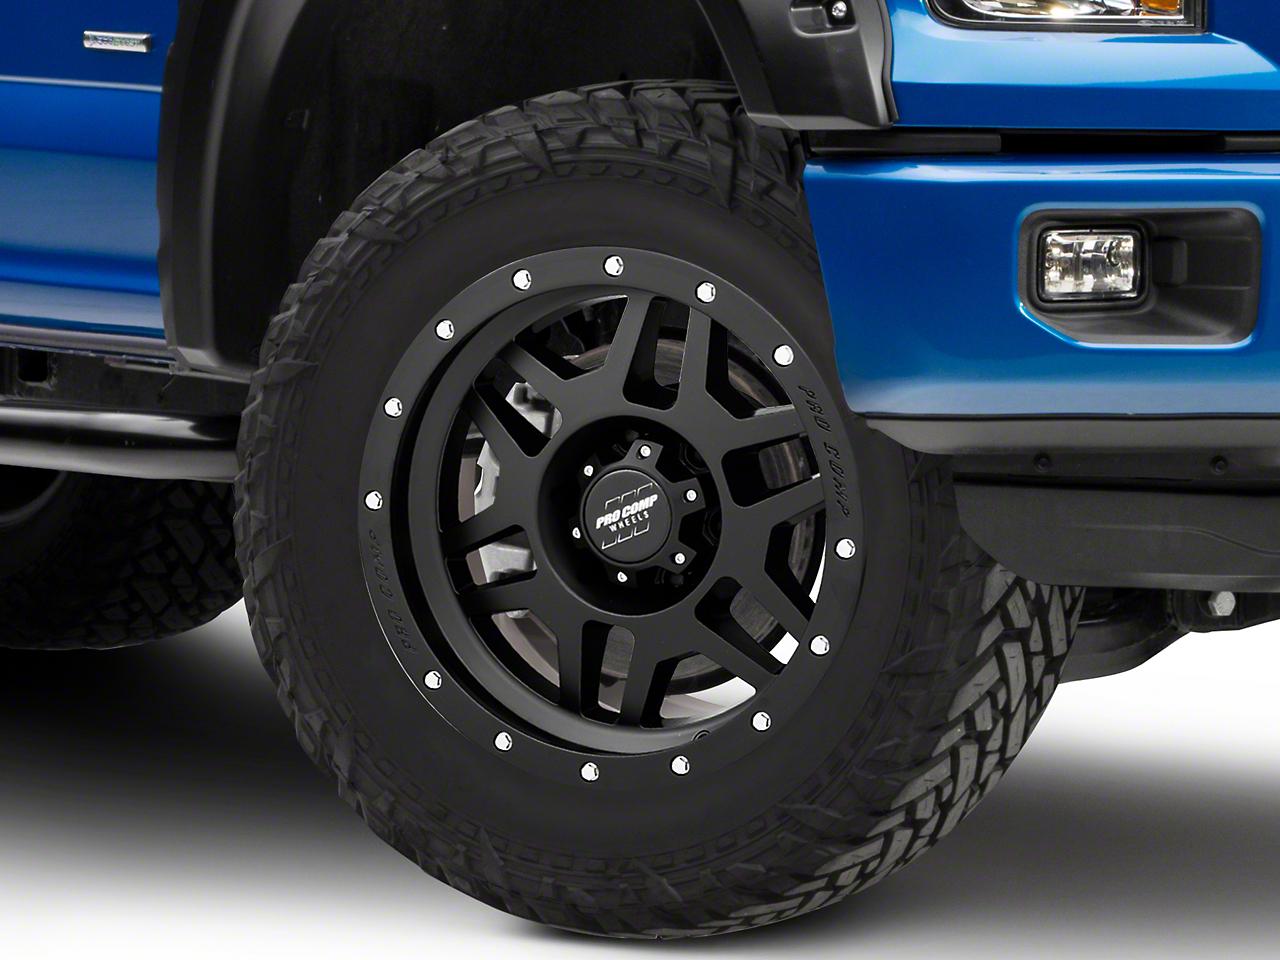 Pro Comp Phaser Satin Black 6-Lug Wheel - 20x9 (04-18 F-150)